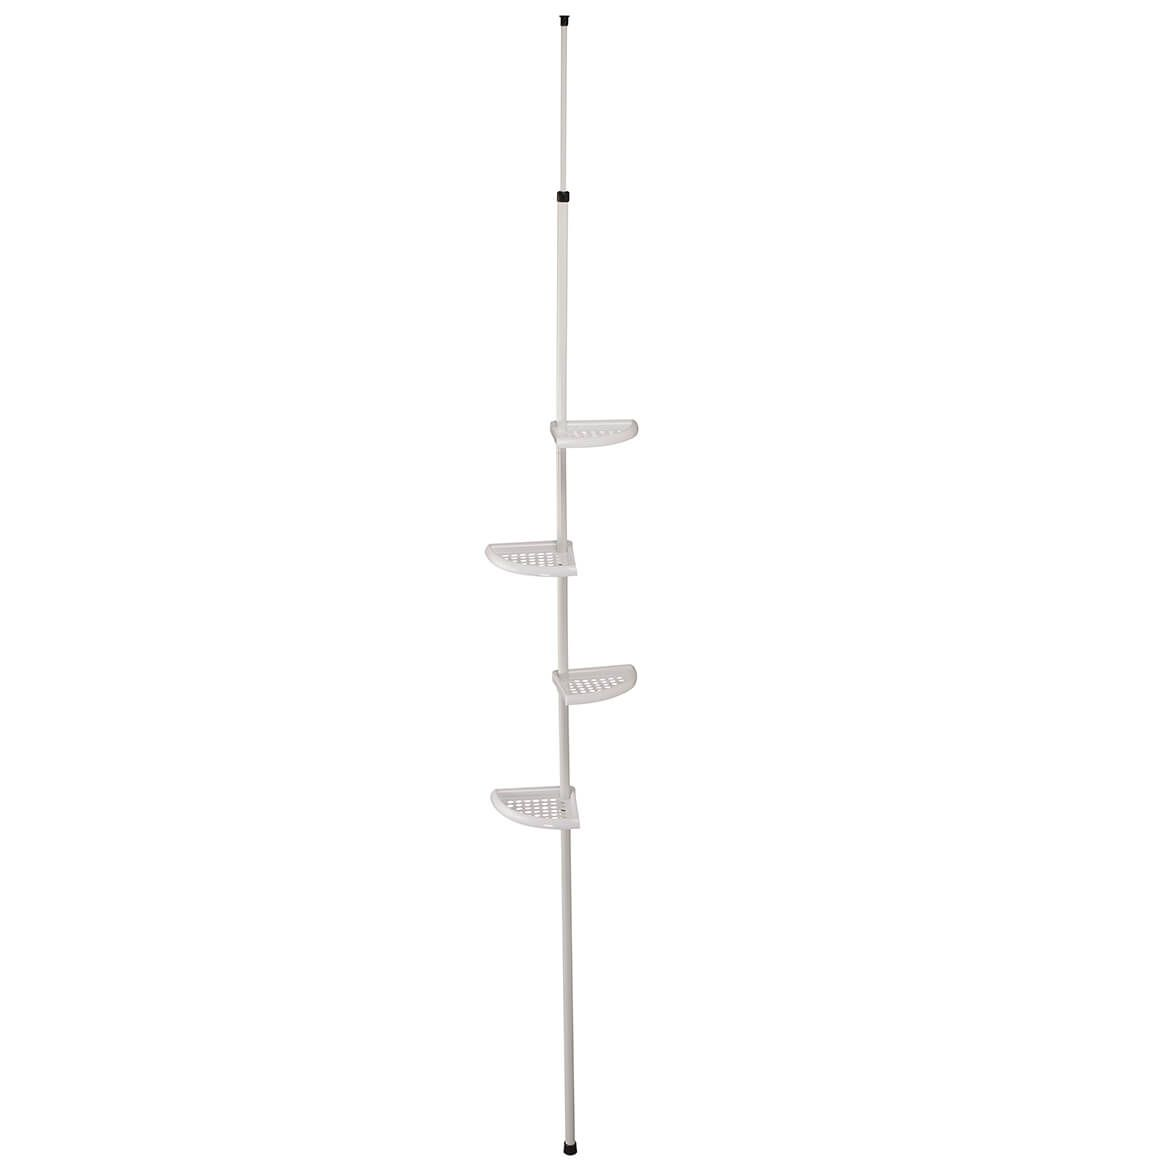 4-Tier Plastic Tension Pole Shelf by LivingSURE™-366049